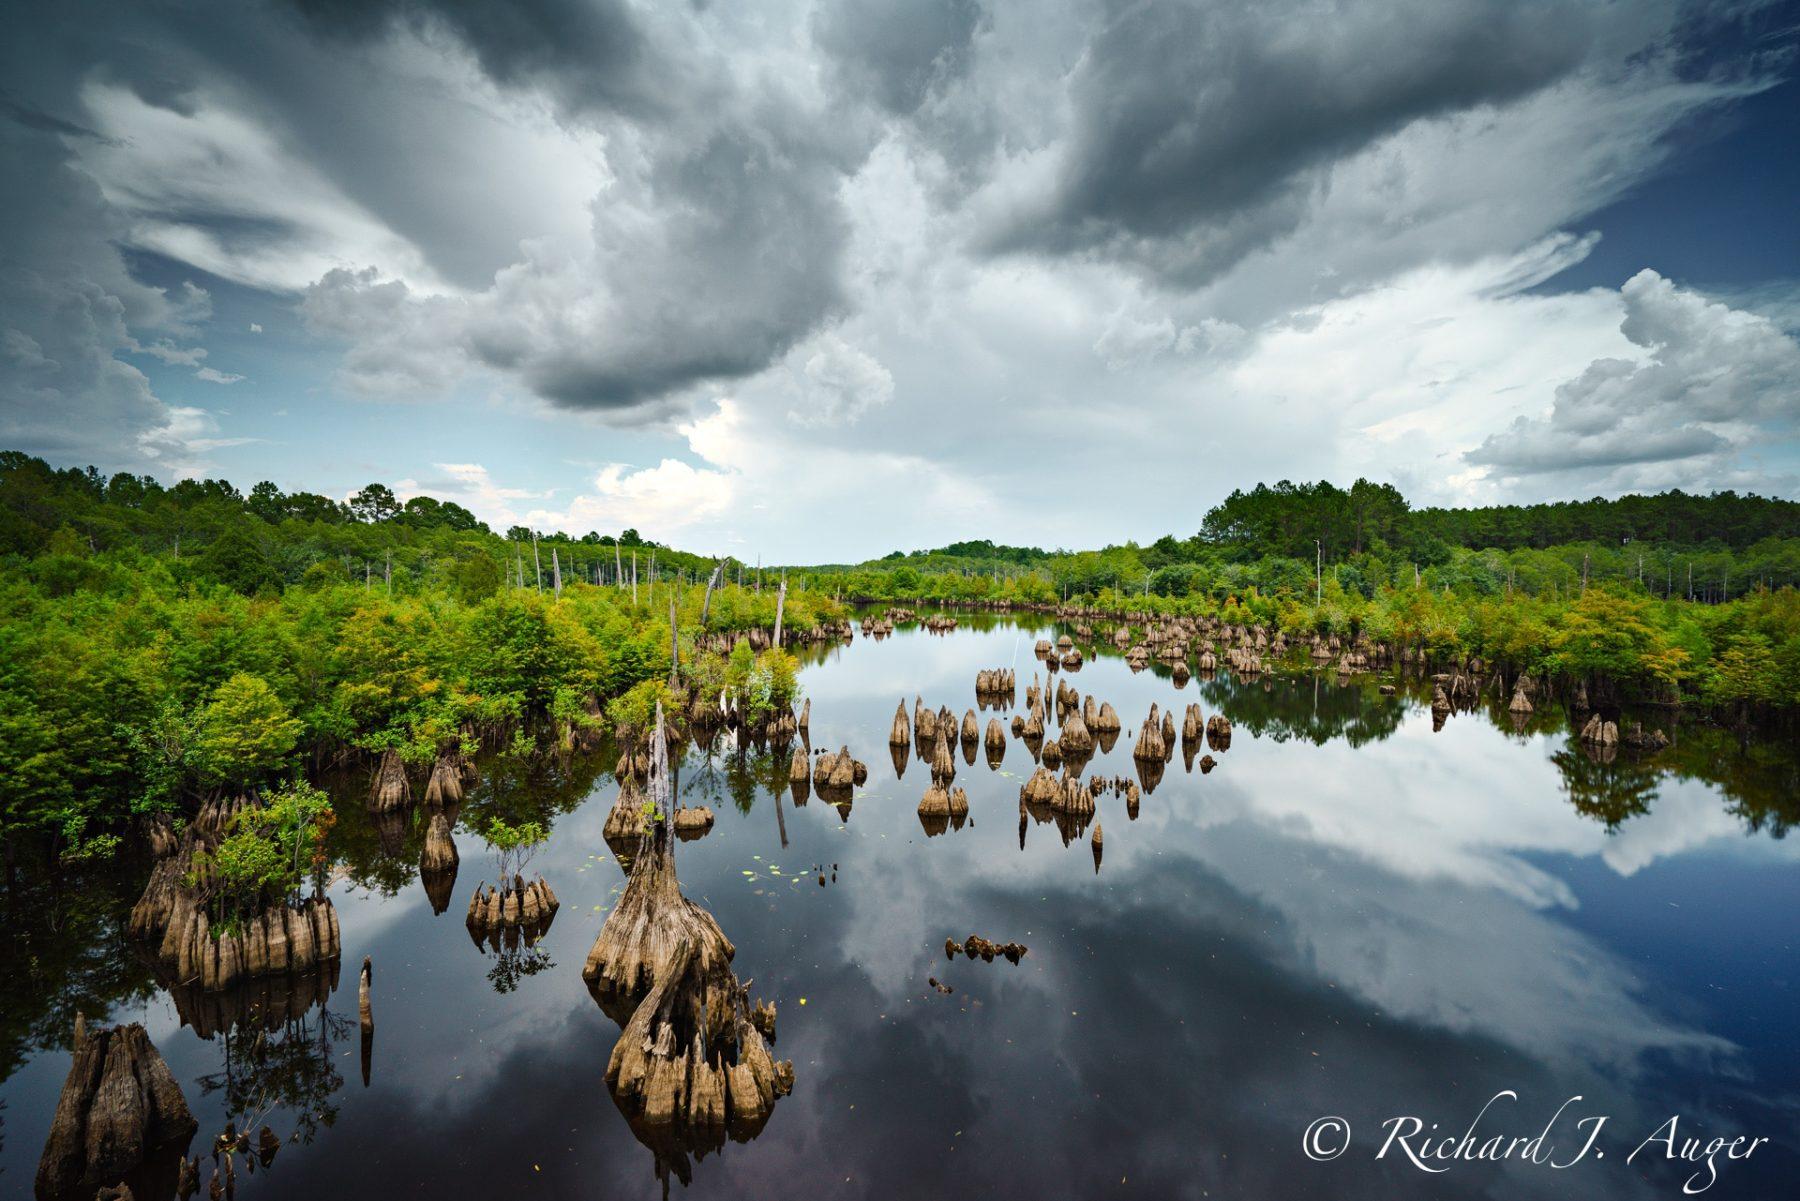 Dead Lakes, Florida, Wewahitchka, Cypress, River, Storm